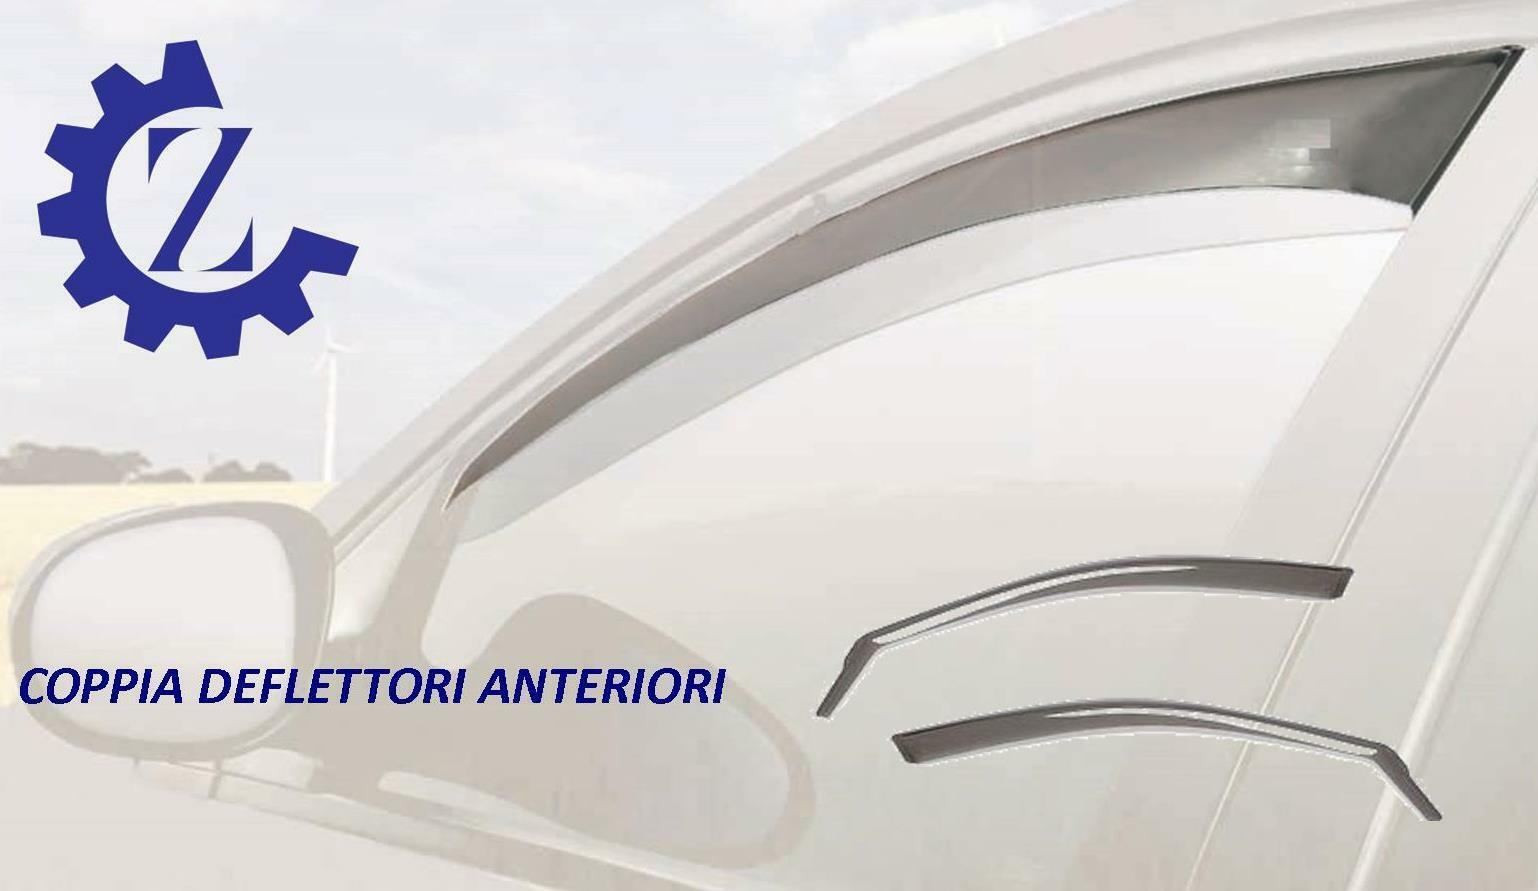 DEFLETTORI ARIA ANTITURBO PER VW GOLF - JETTA 88 91 5 porte